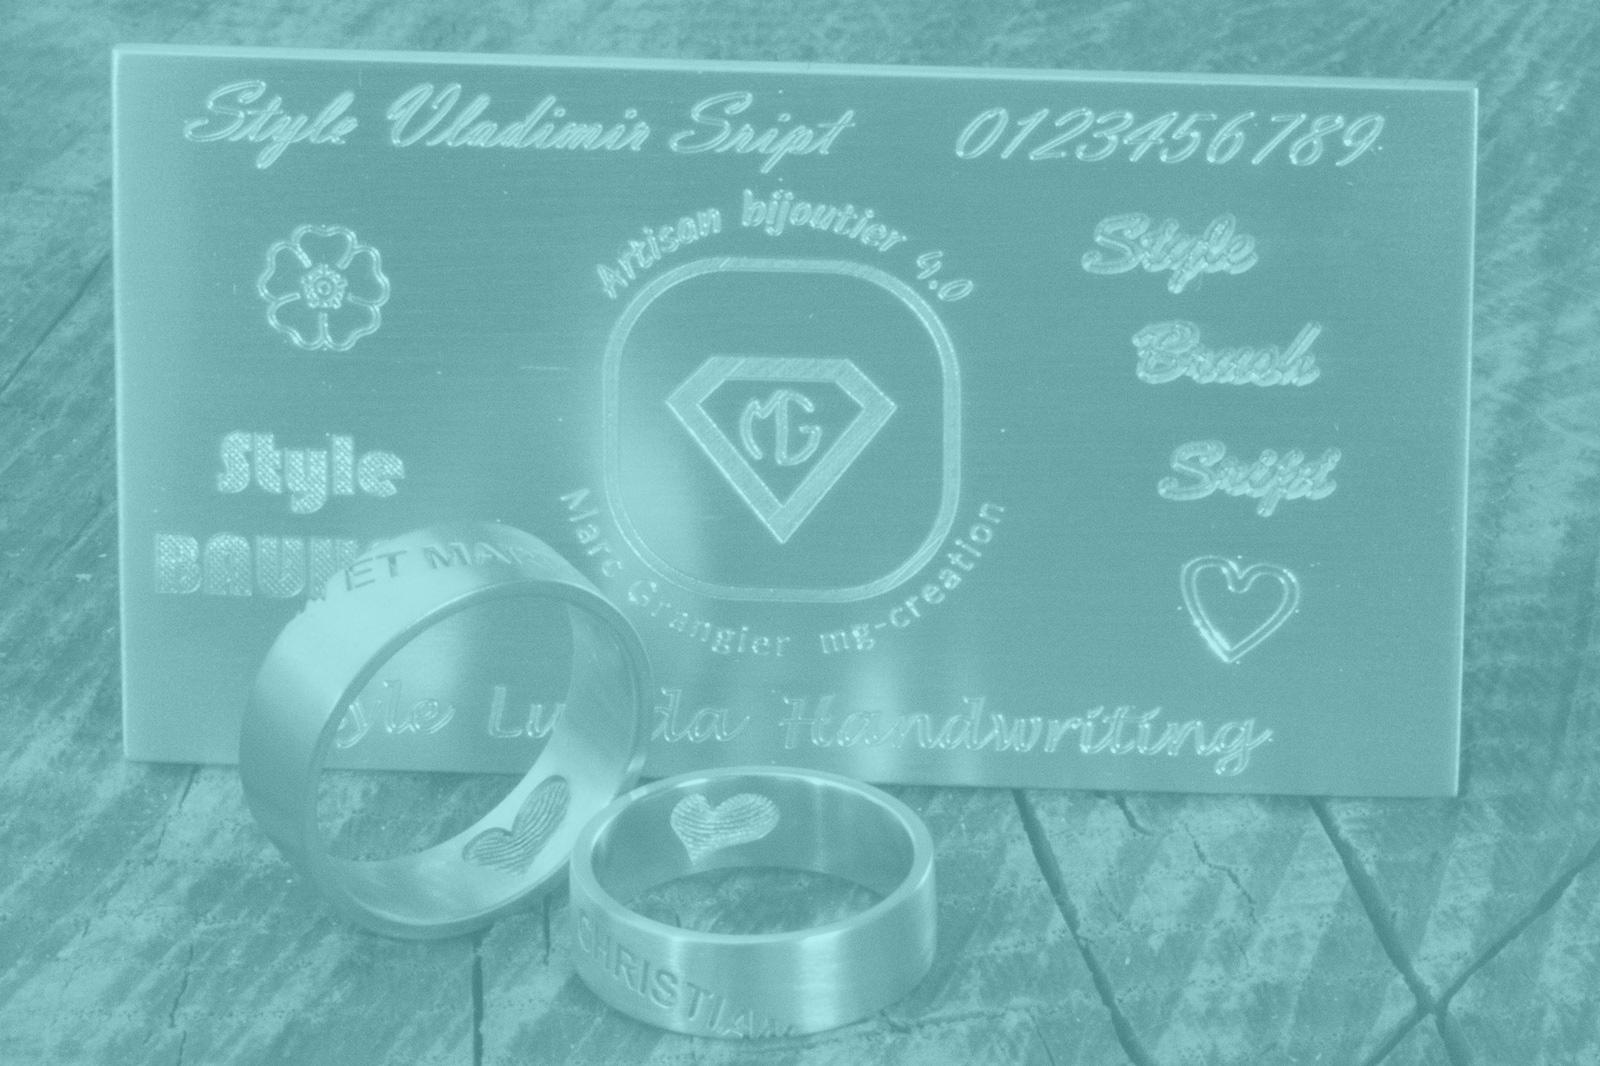 Faites graver vos bijoux - Texte / Ecriture manuscrite / Logo / Empreintes